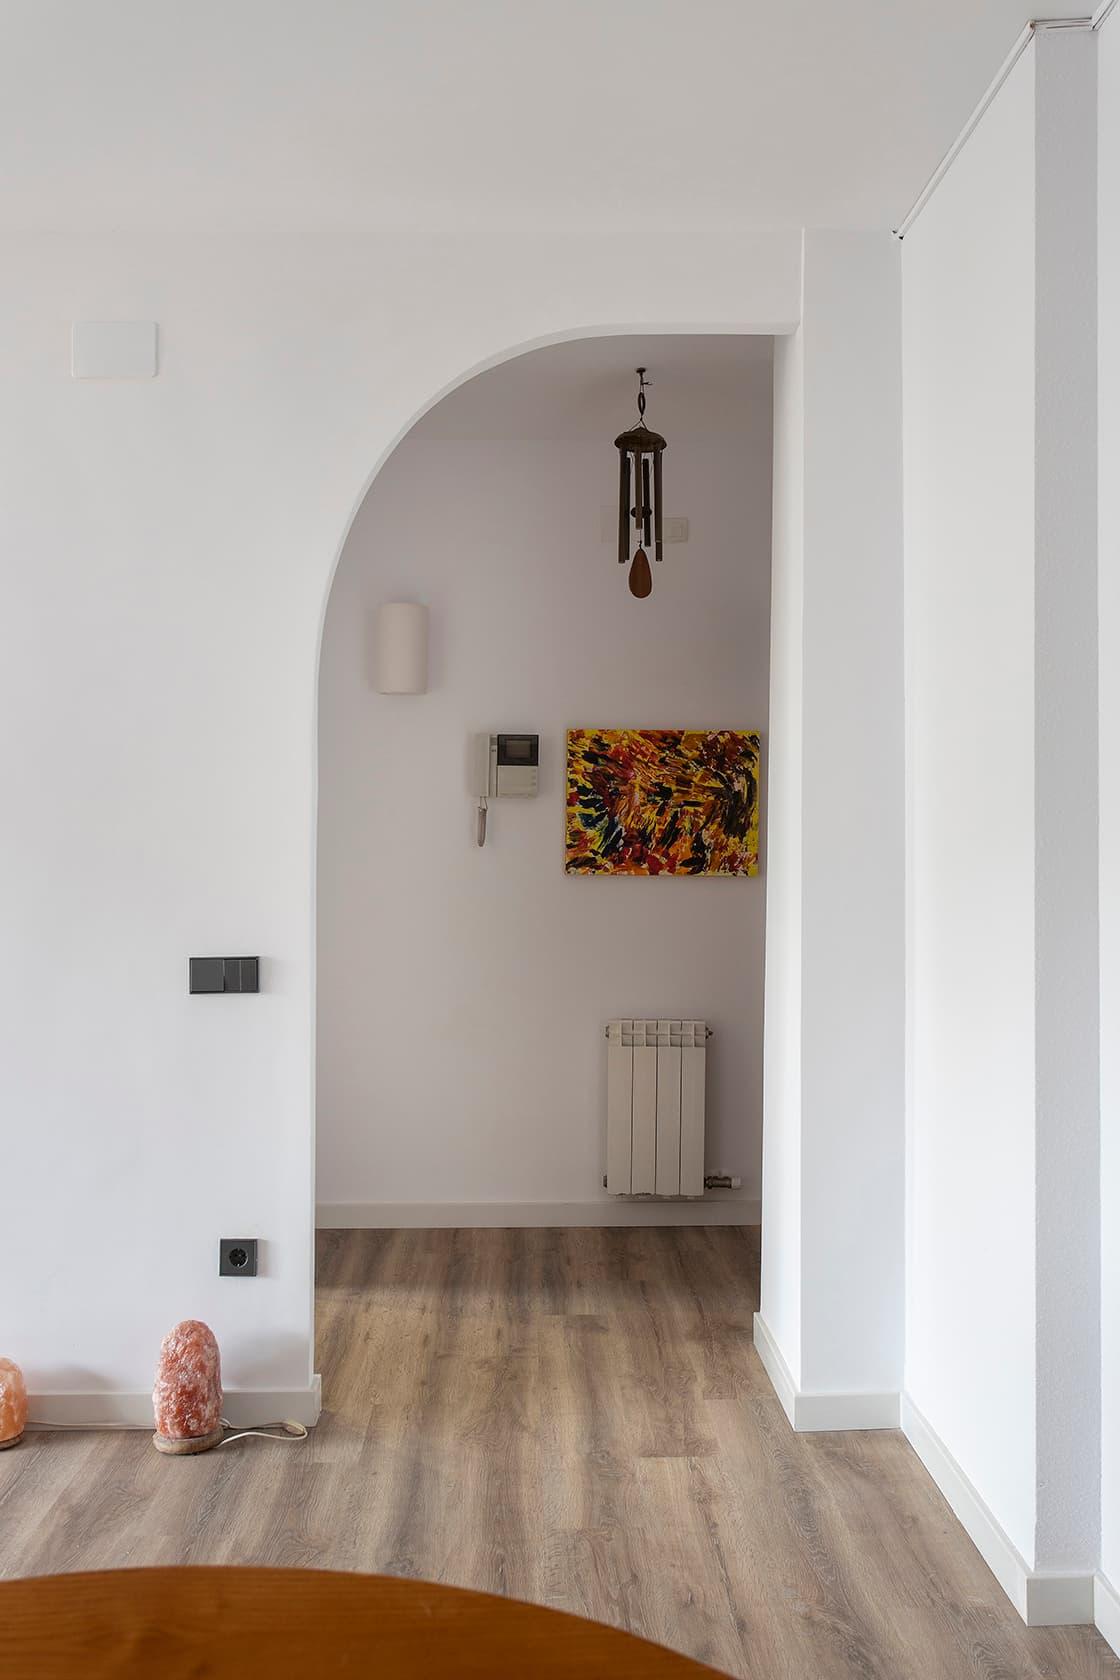 puerta en semiarco